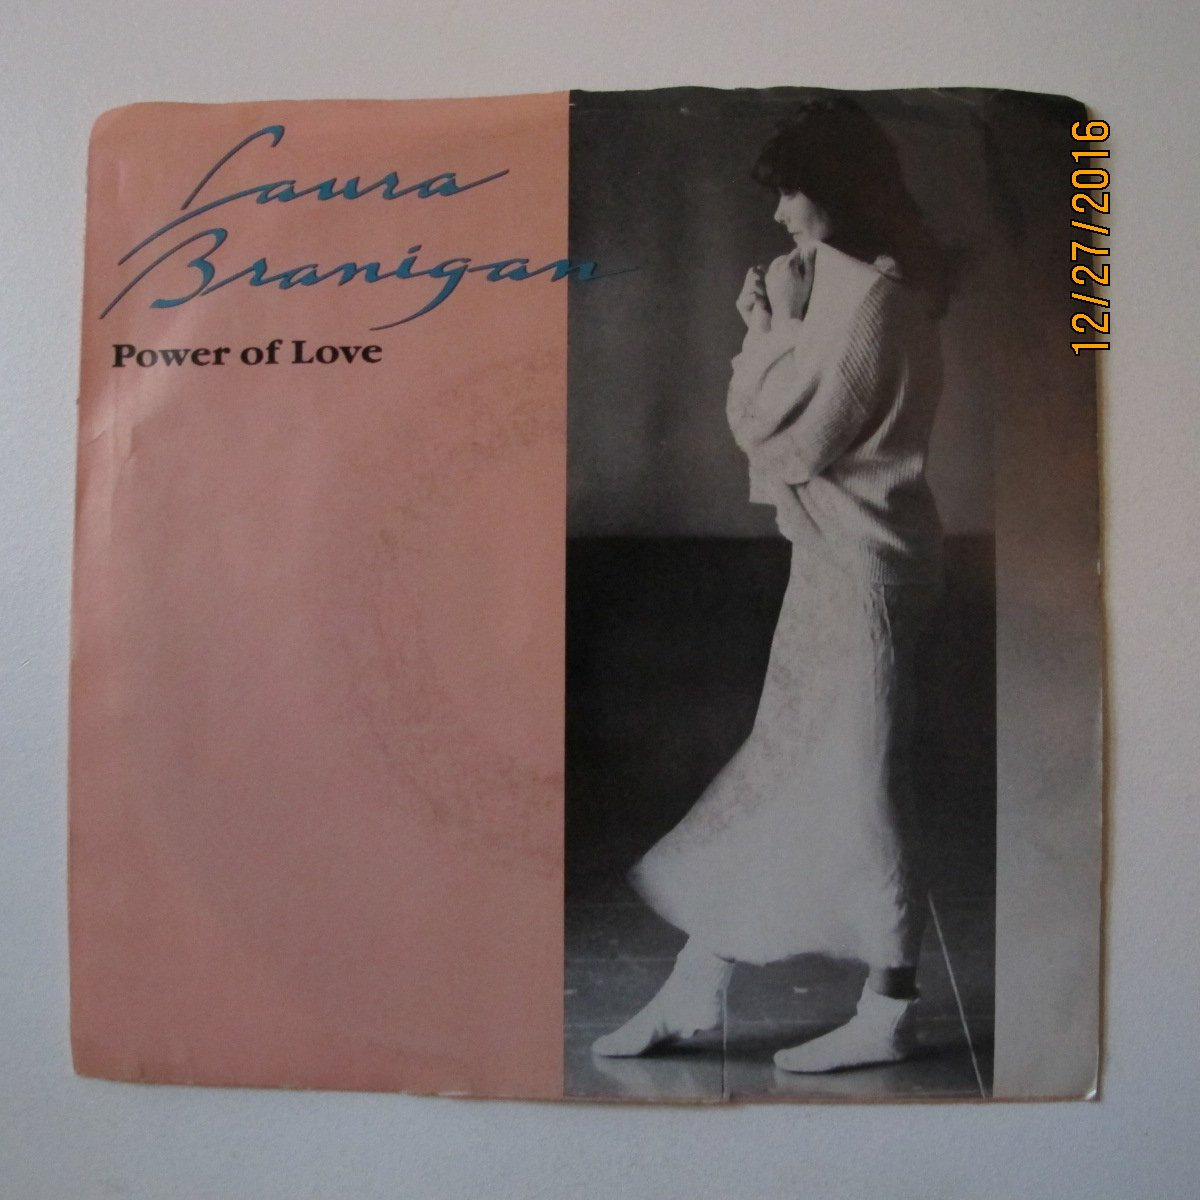 Power of Love / Spirit of Love 45 rpm